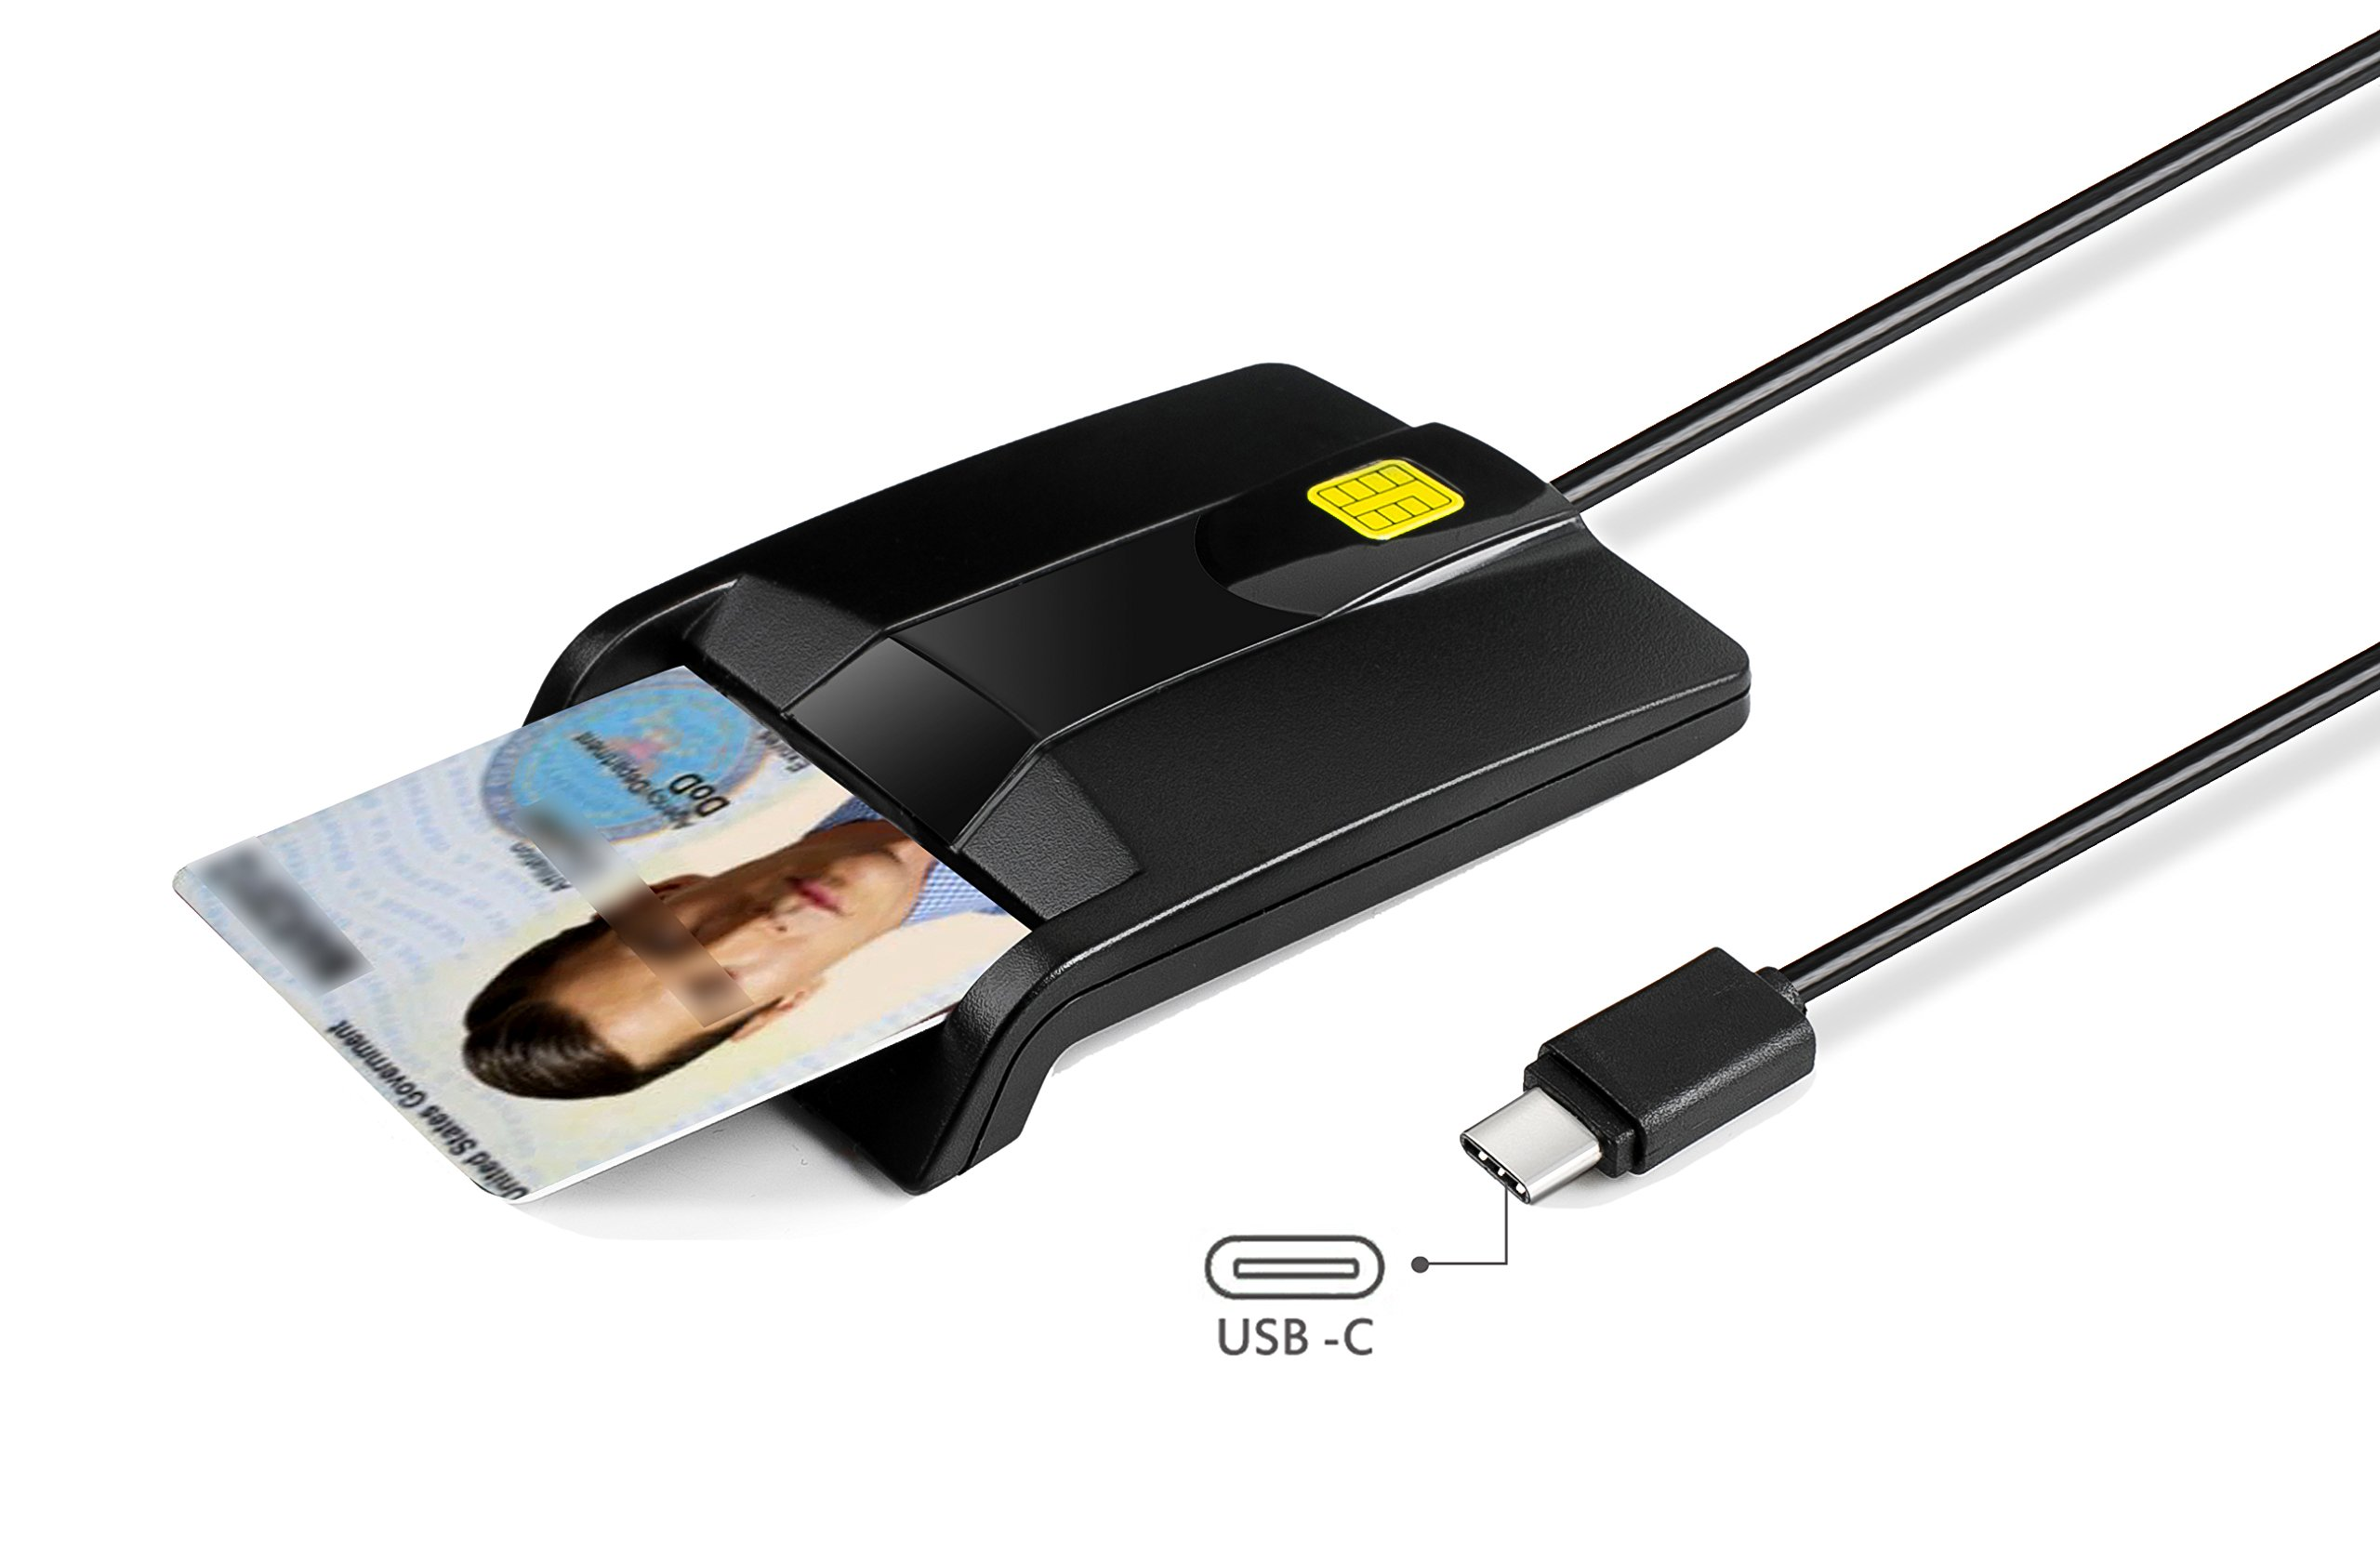 Type C Smart Card Reader Saicoo DOD Military USB-C Common Access CAC Card Reader, Compatible with Windows (32/64bit) XP/Vista/ 7/8/10, Mac OS X by saicoo